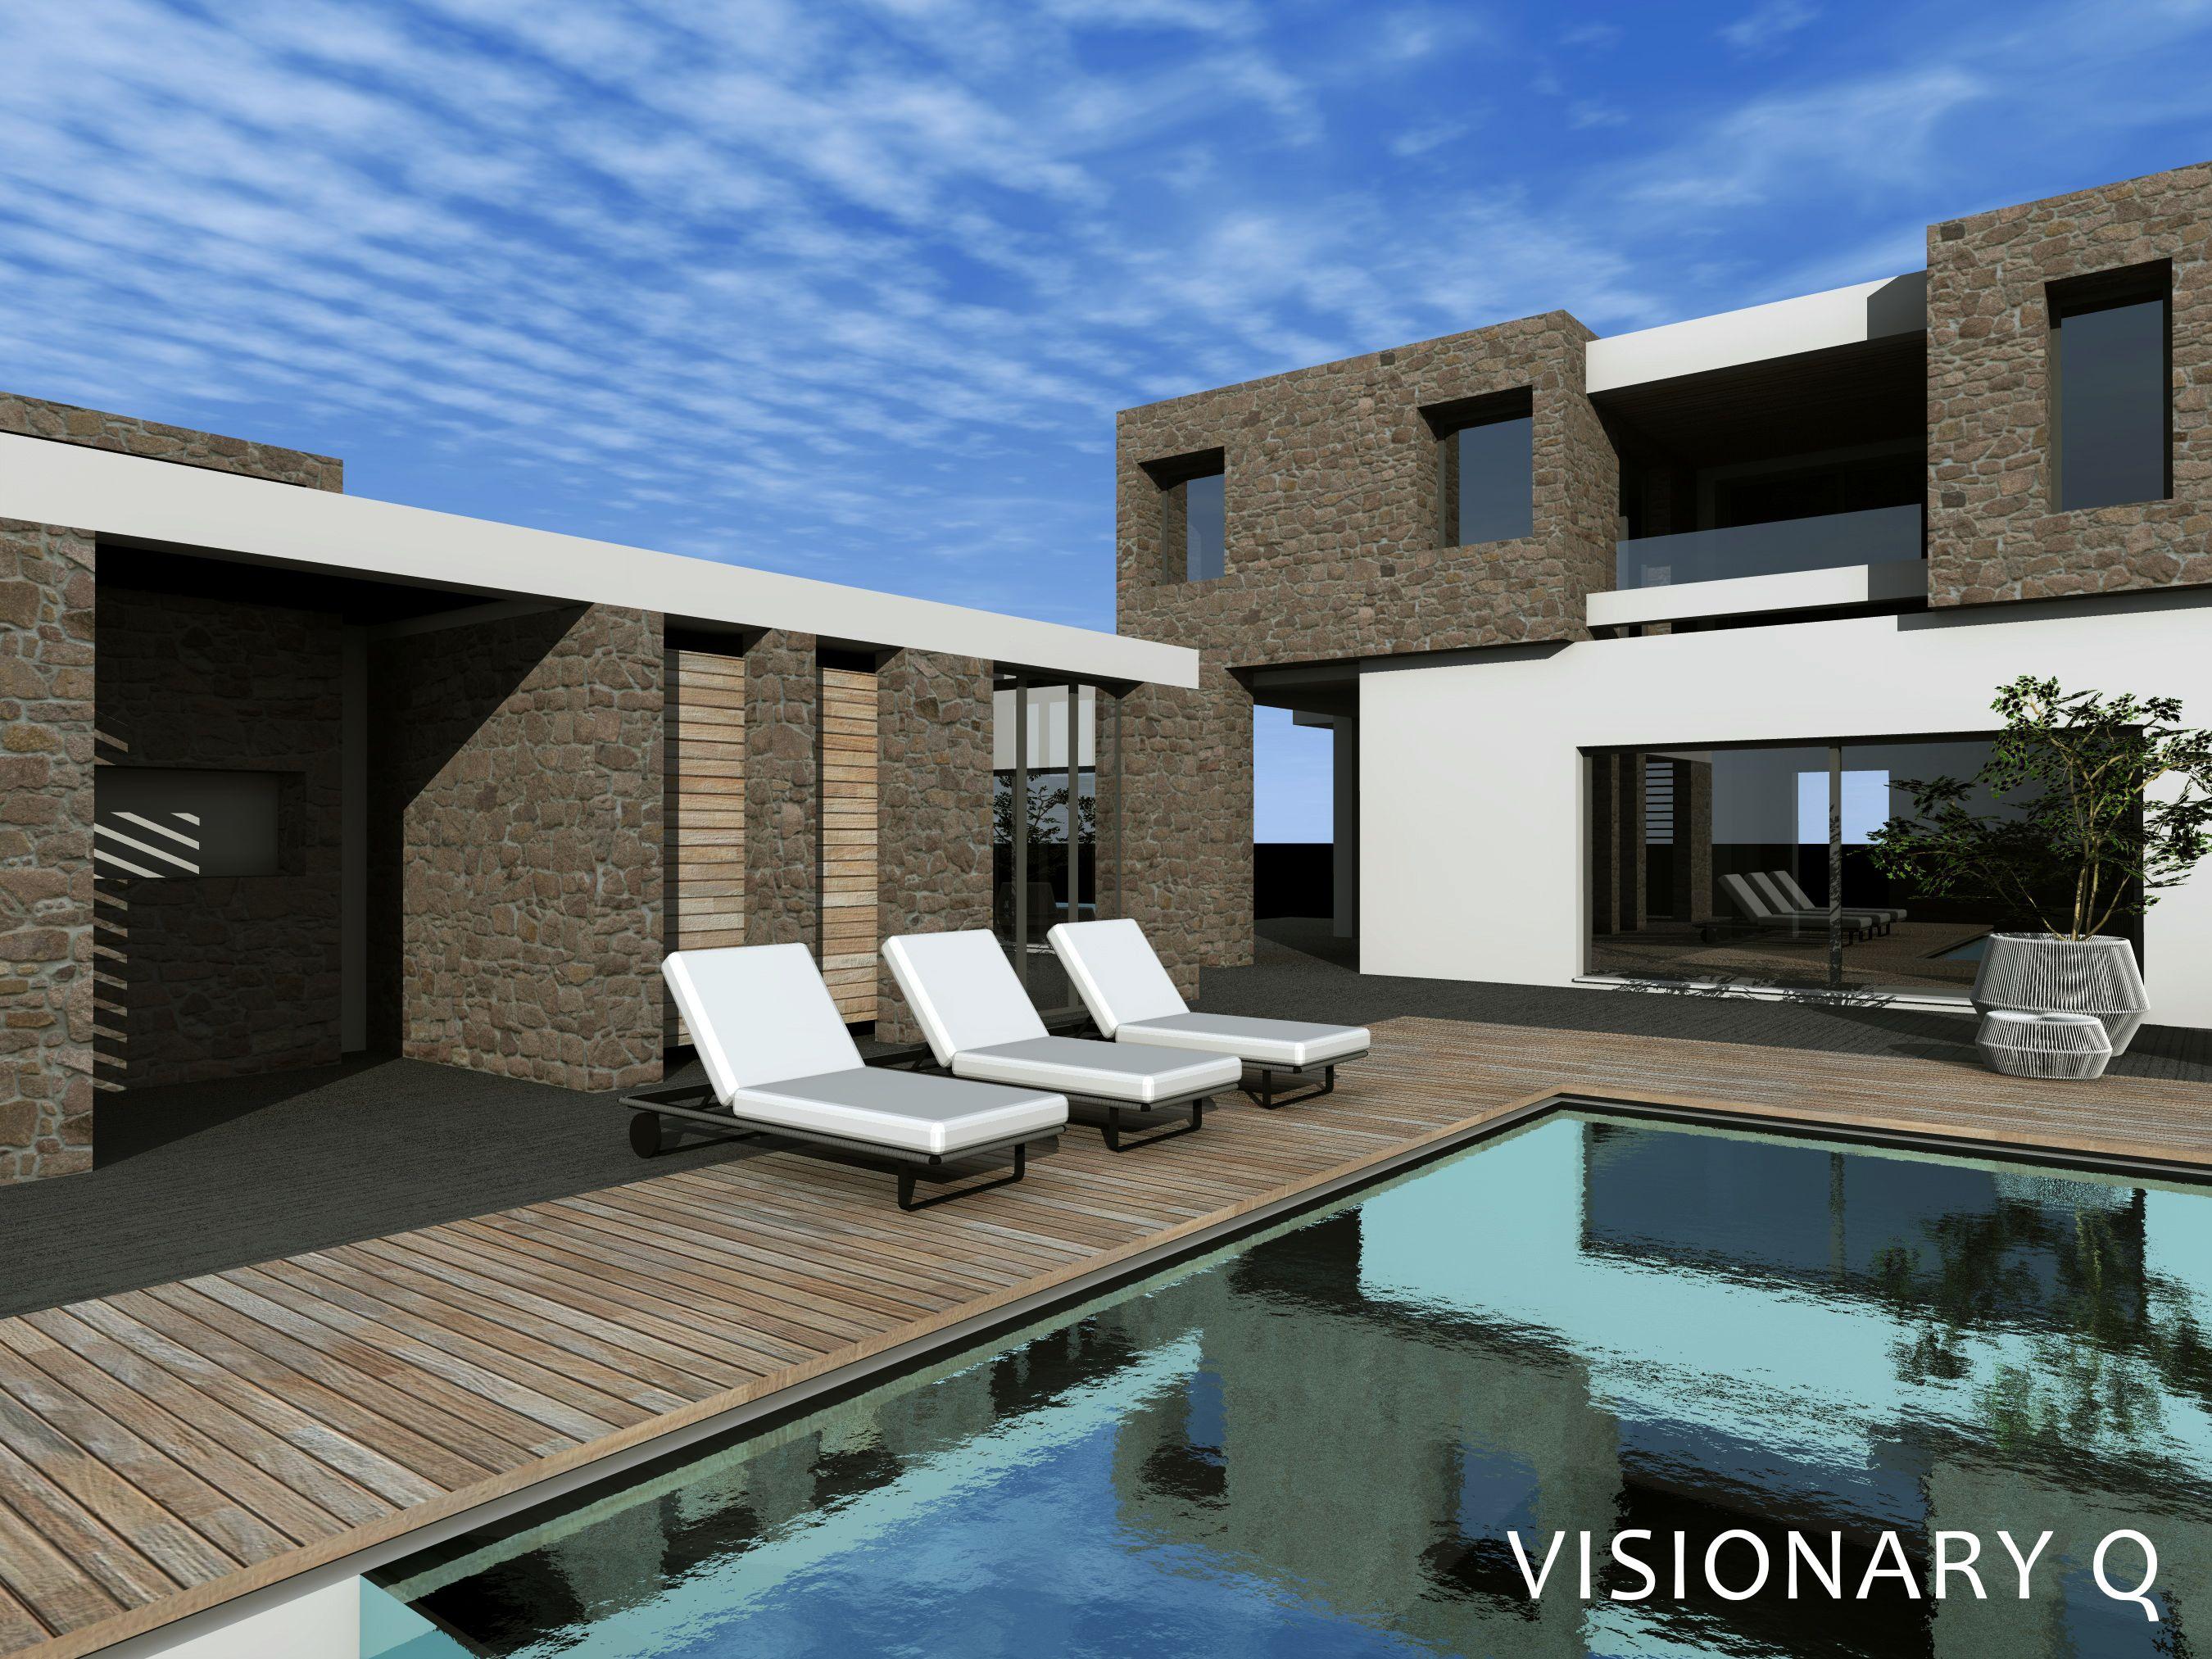 Greek Island summer villa, designed by VISIONARY Q